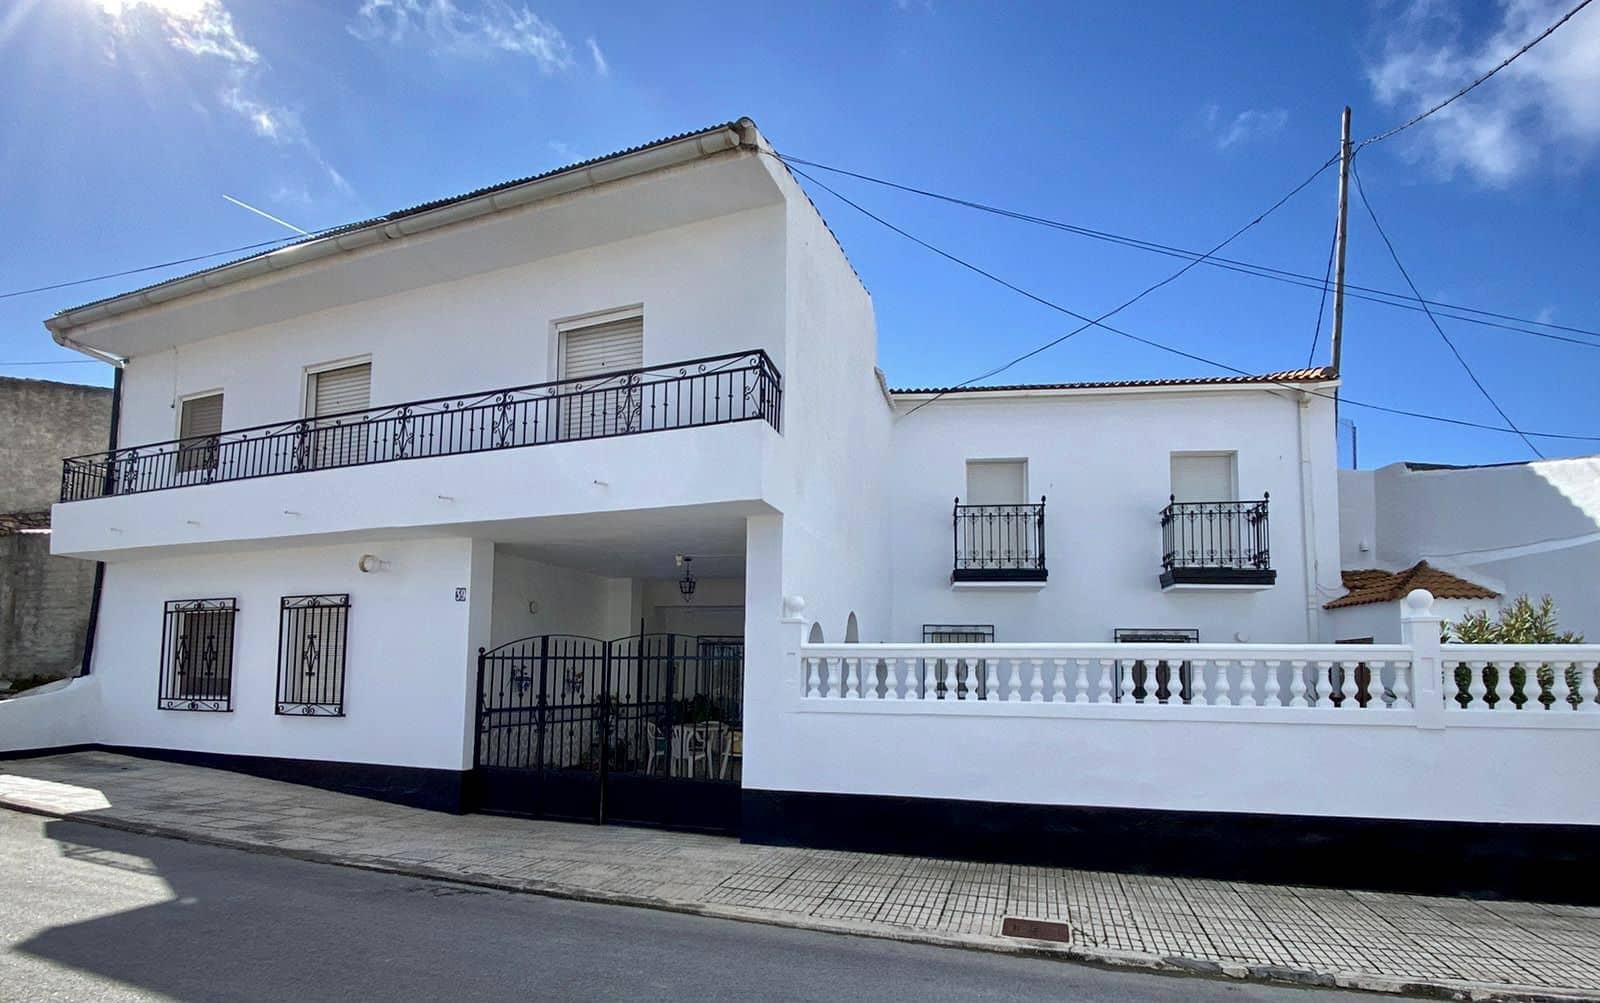 6 bedroom Townhouse for sale in Cuevas del Campo with garage - € 144,950 (Ref: 5886792)